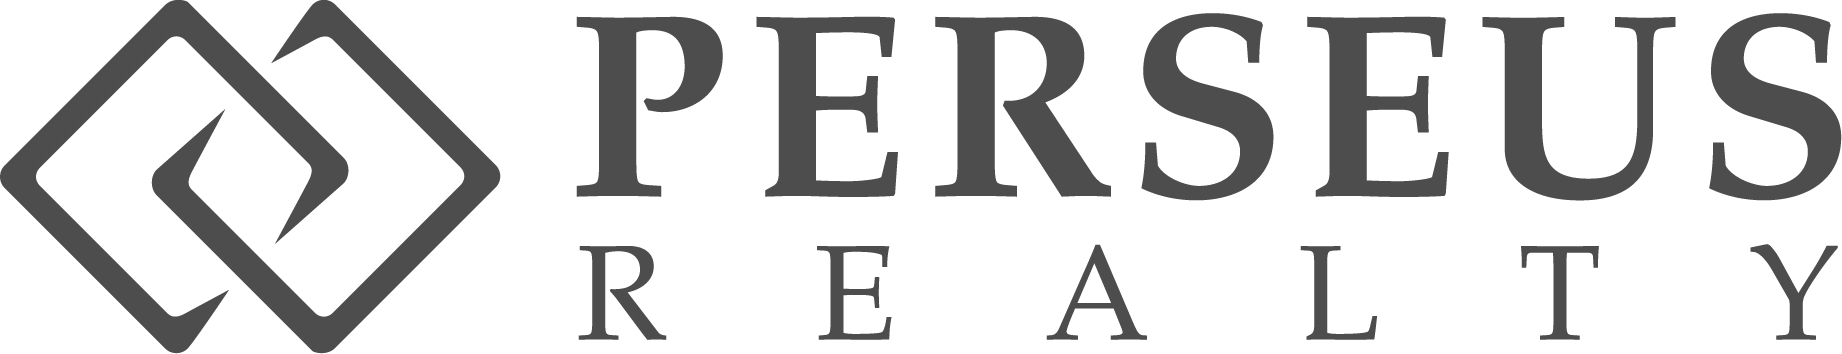 Perseus Realty - Penn Eleven